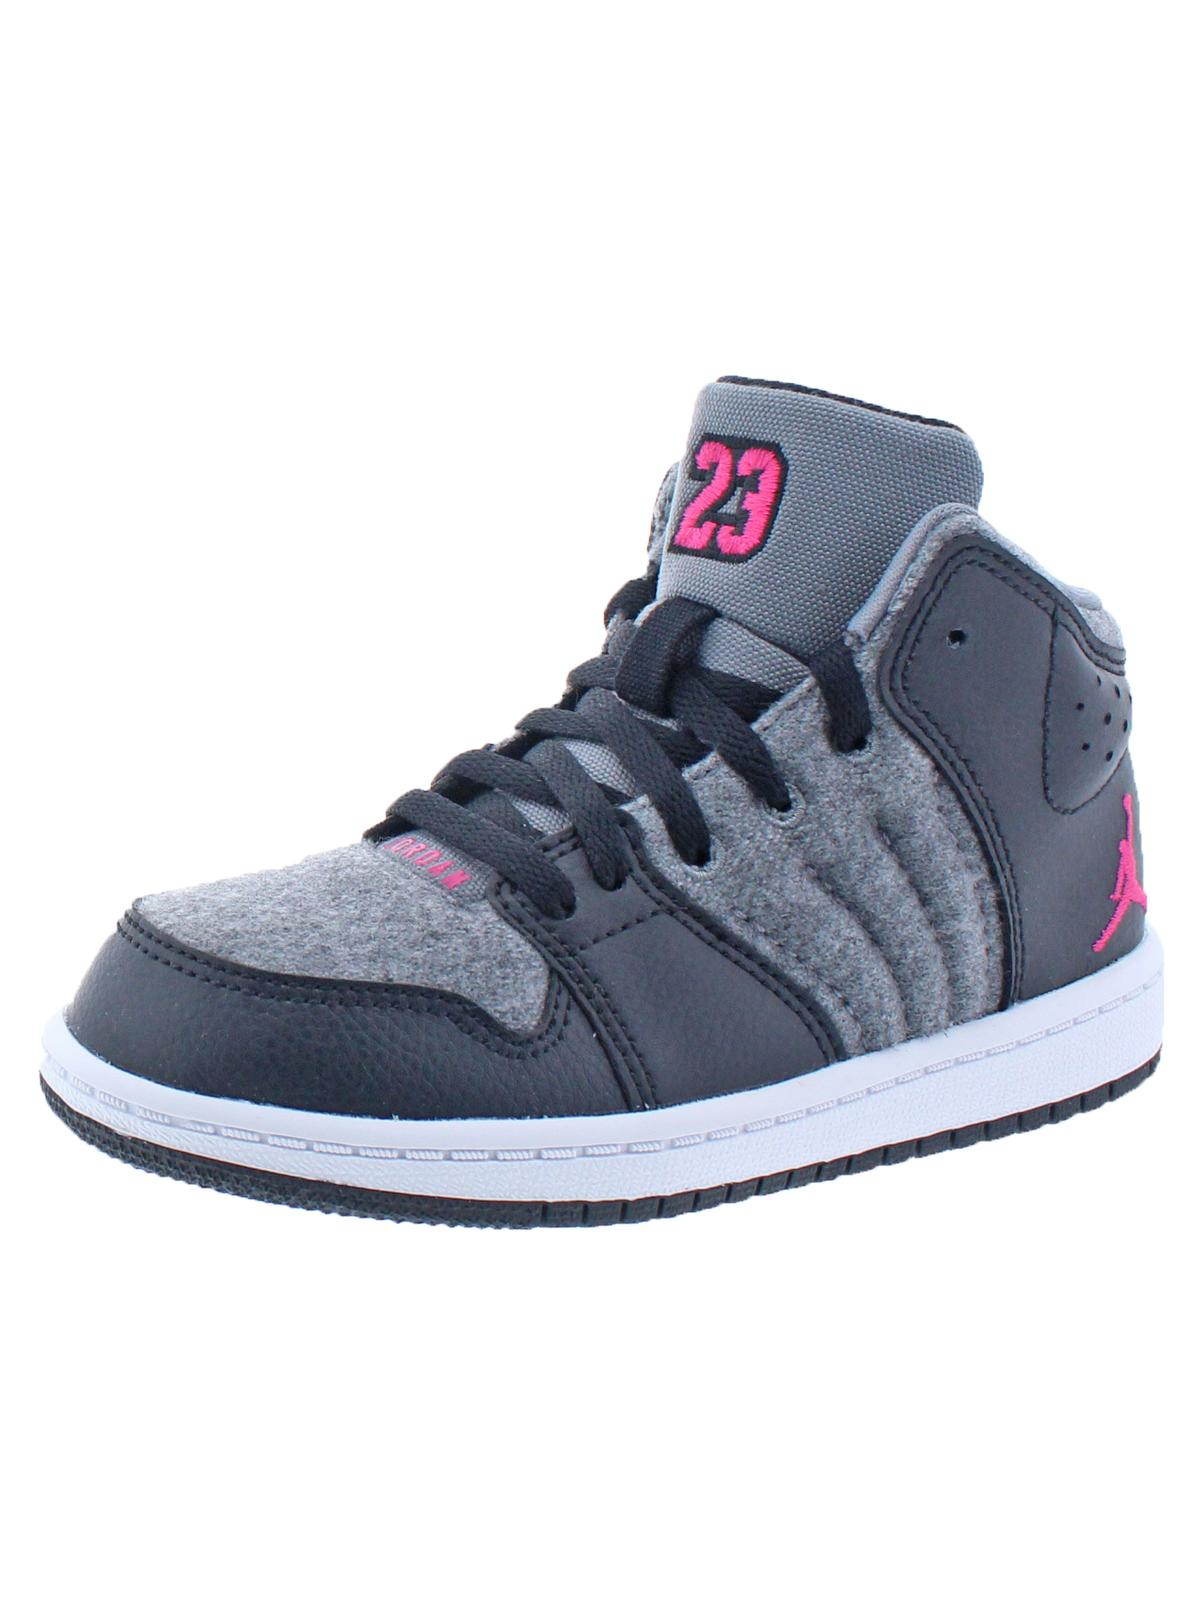 Jordan Girls 1 Flight 4 Premium GP Little Kid Hightop Fashion Sneakers Black